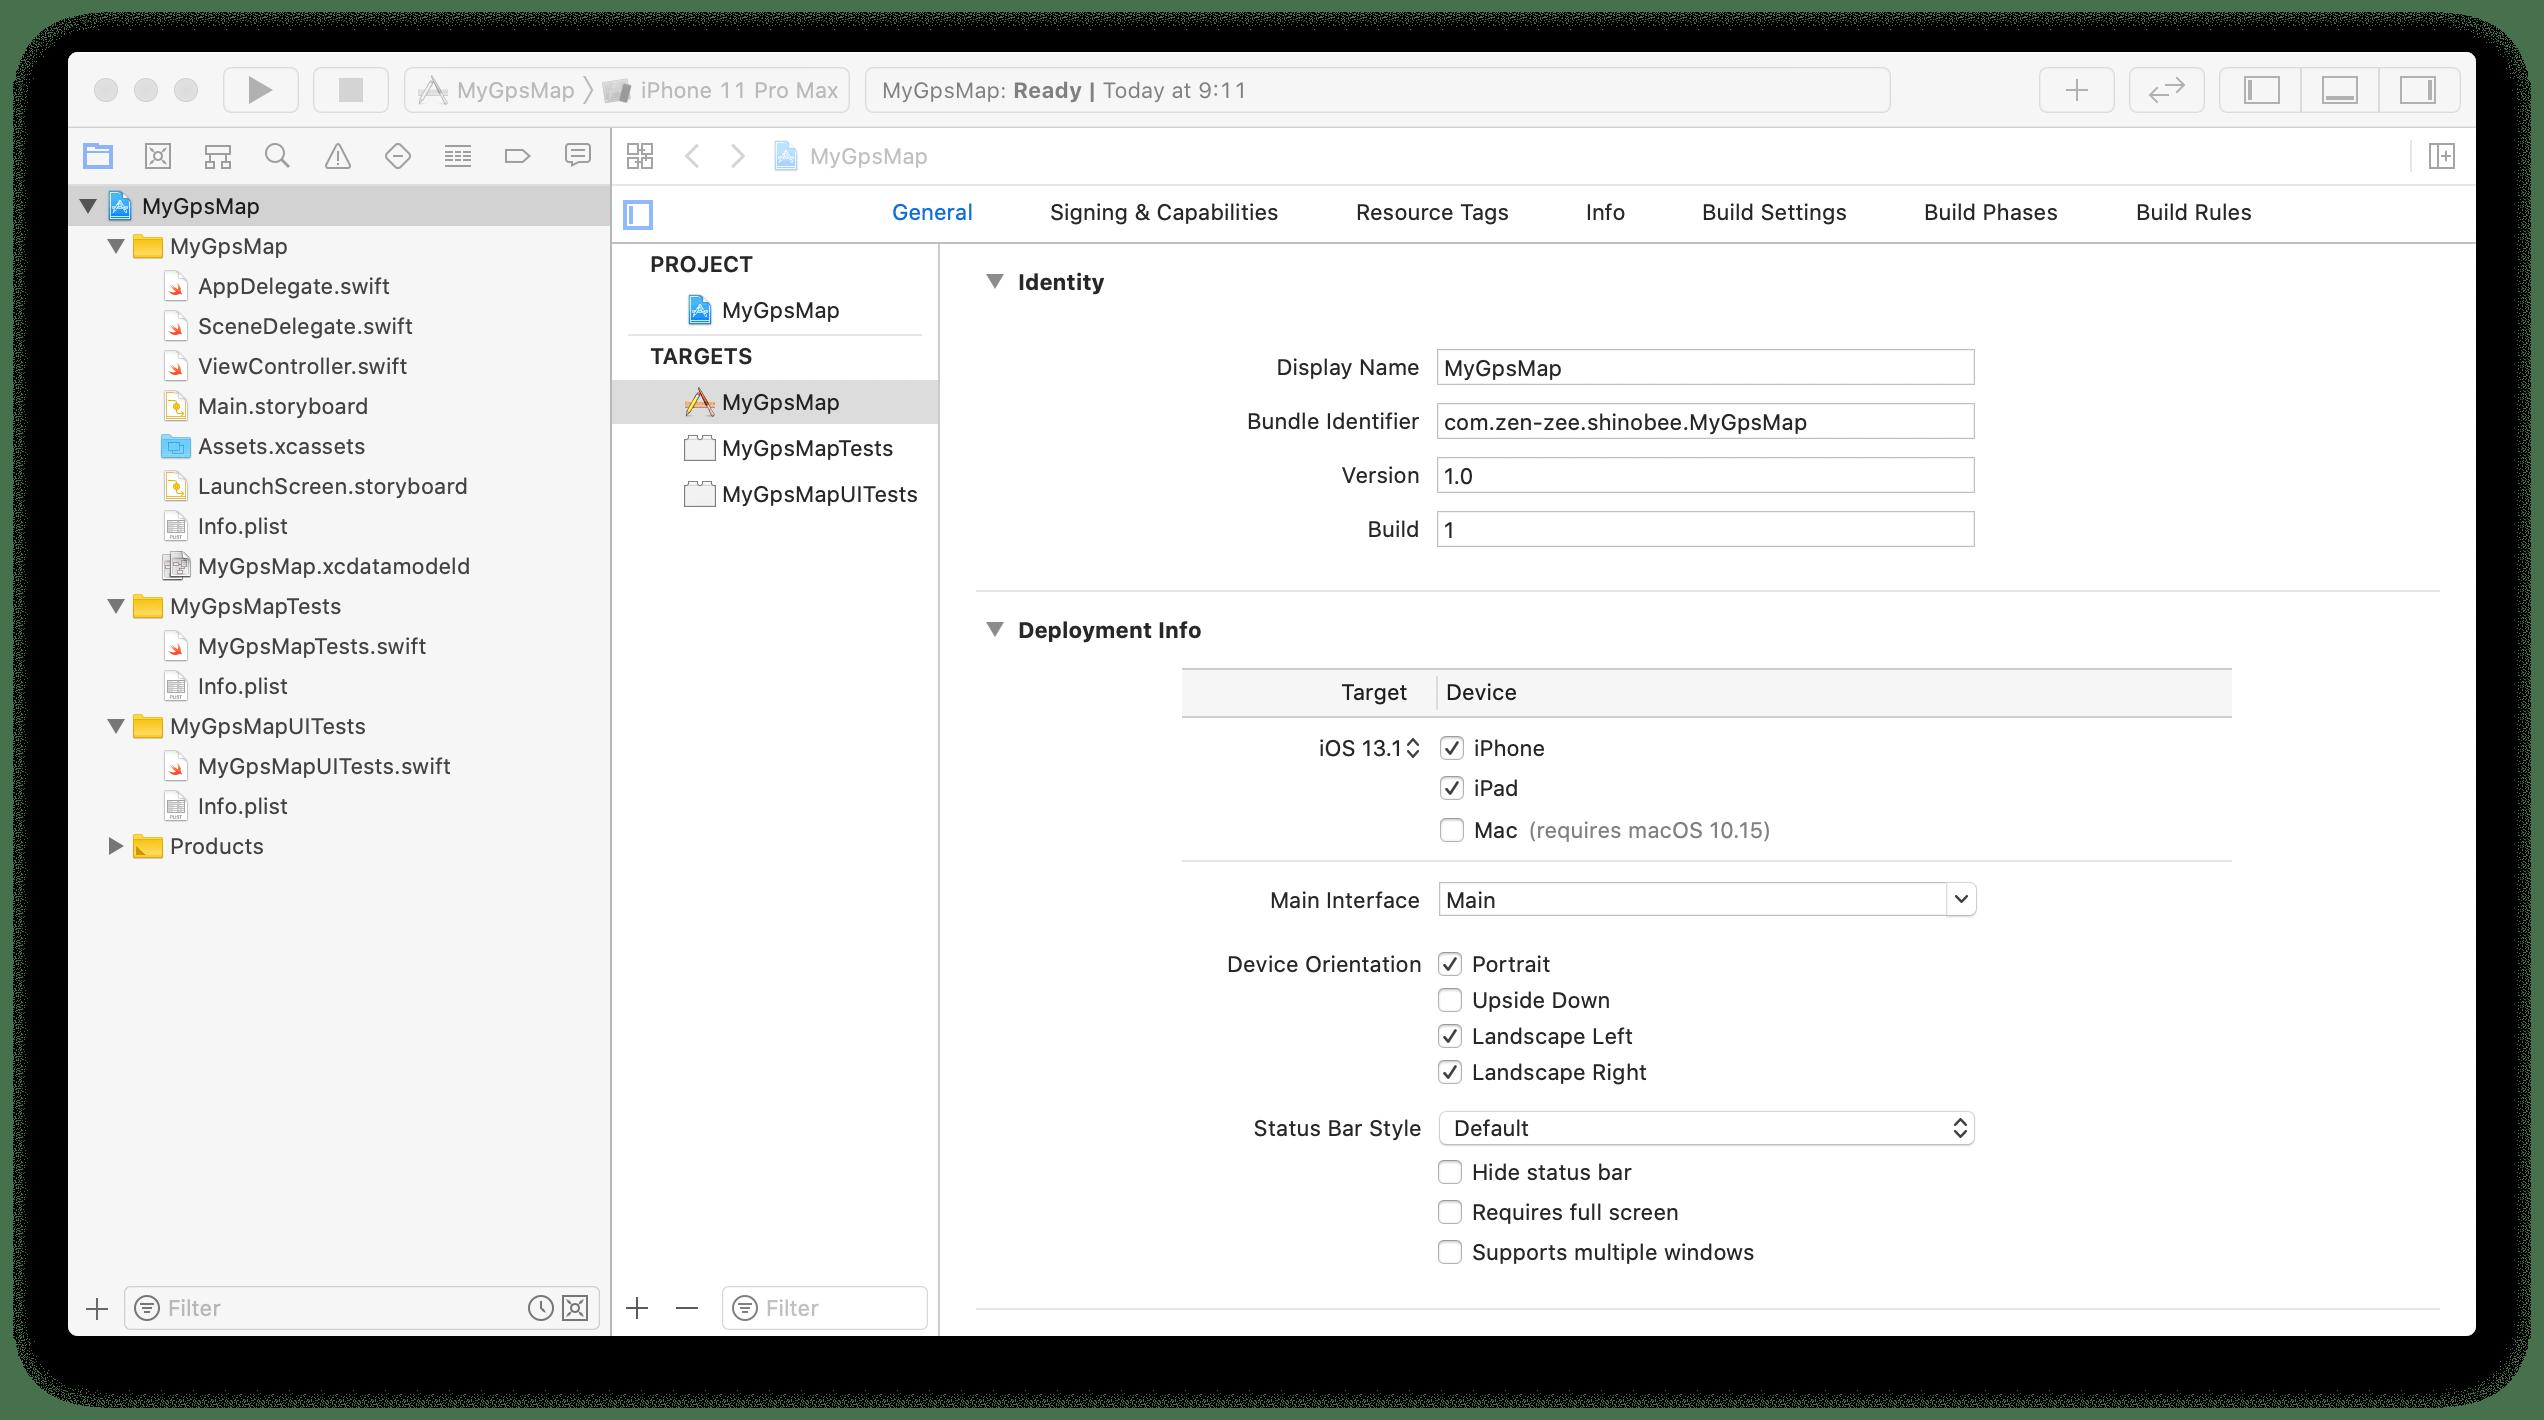 ProjectMyGpsMap.png